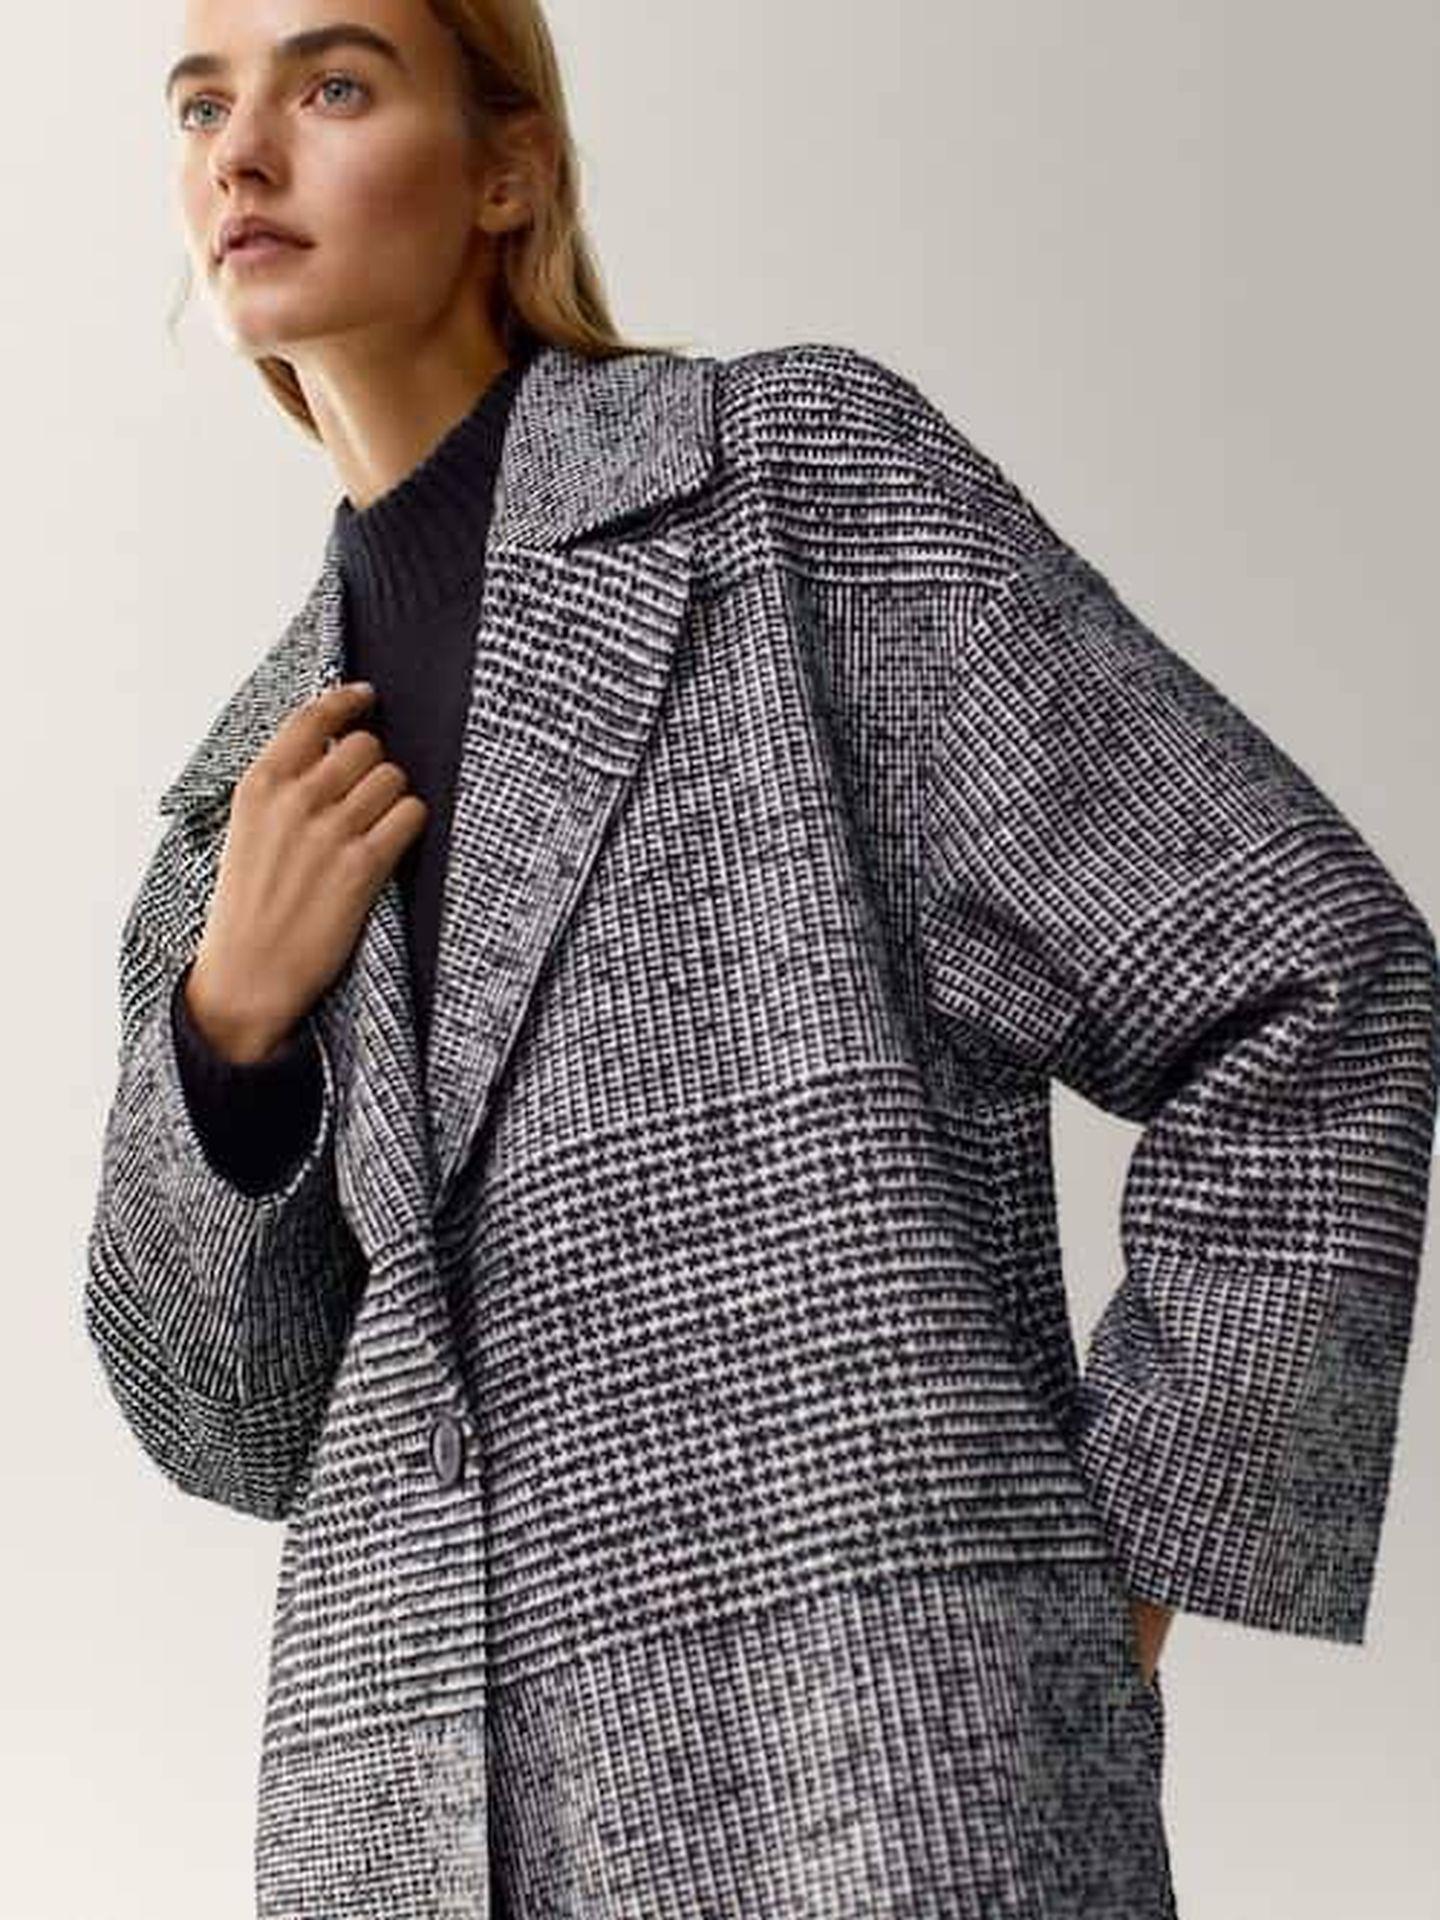 El abrigo de Massimo Dutti. (Cortesía)